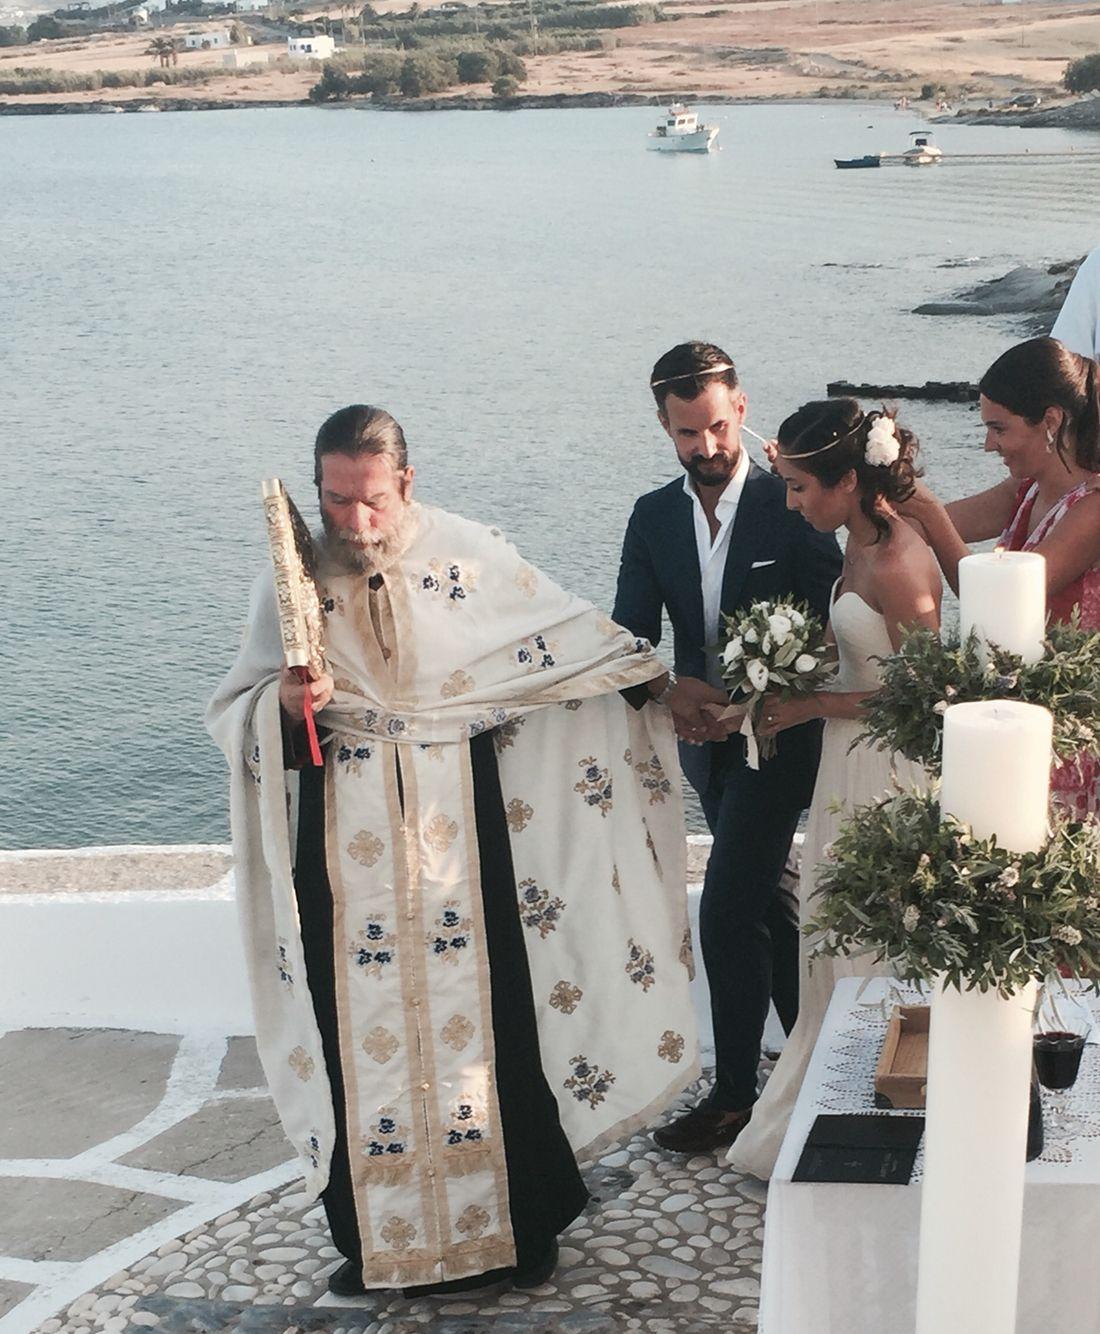 Paros wedding, Greek wedding, lafetegr, wedding planning, Sakura flower shop, Rosemary lavender thyme mint candles or labades